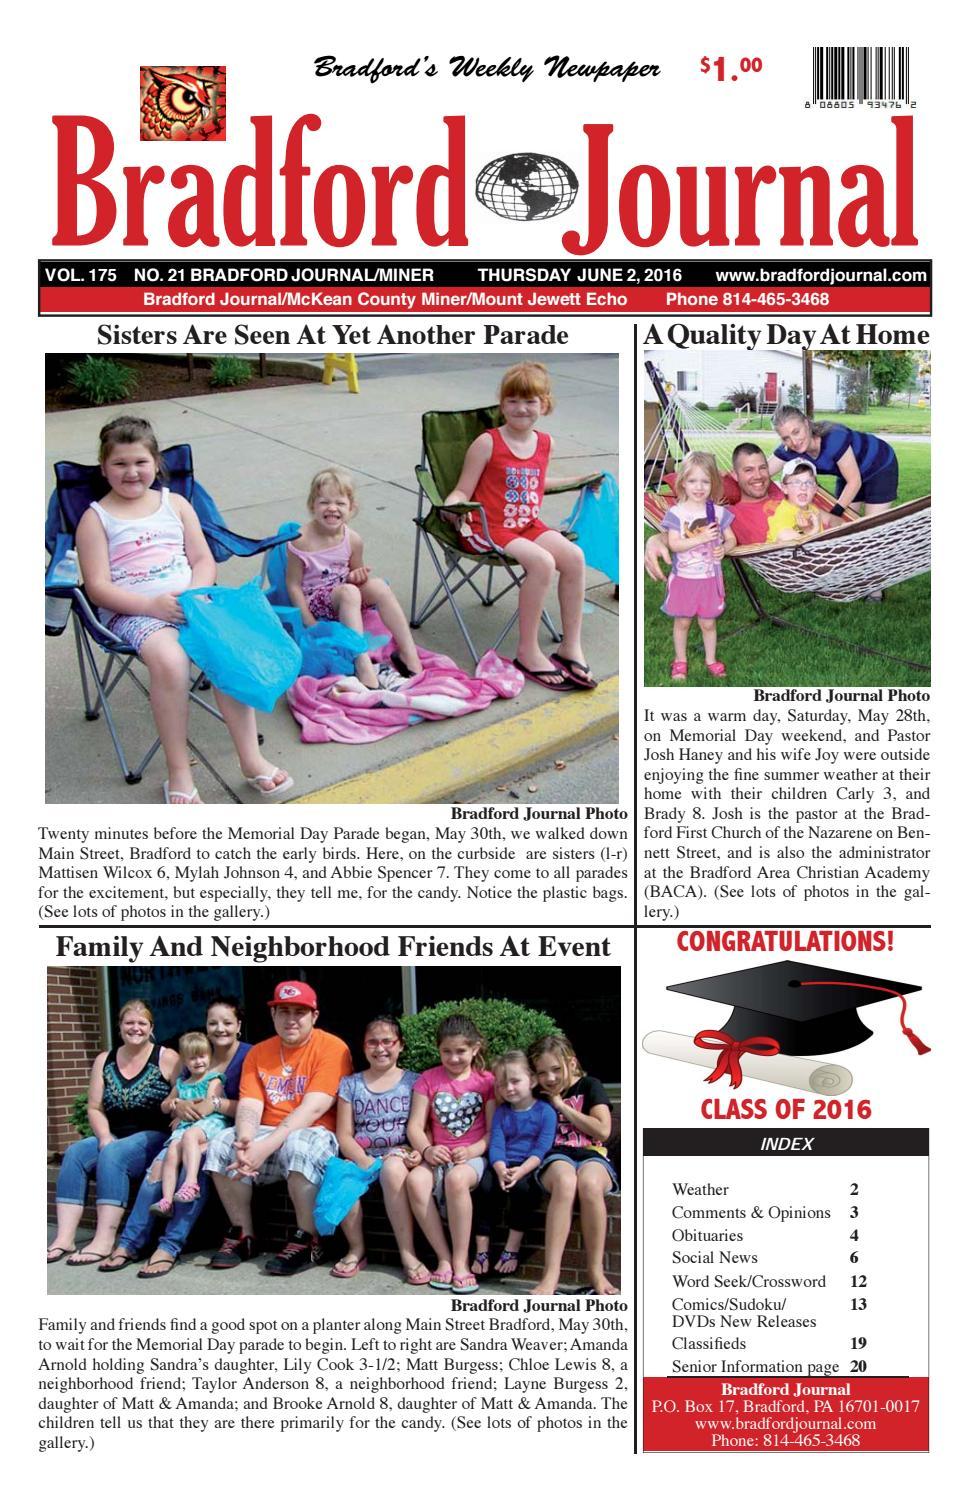 Bradfordjournalcolorissue6 2 16u by Bradford Journal - issuu